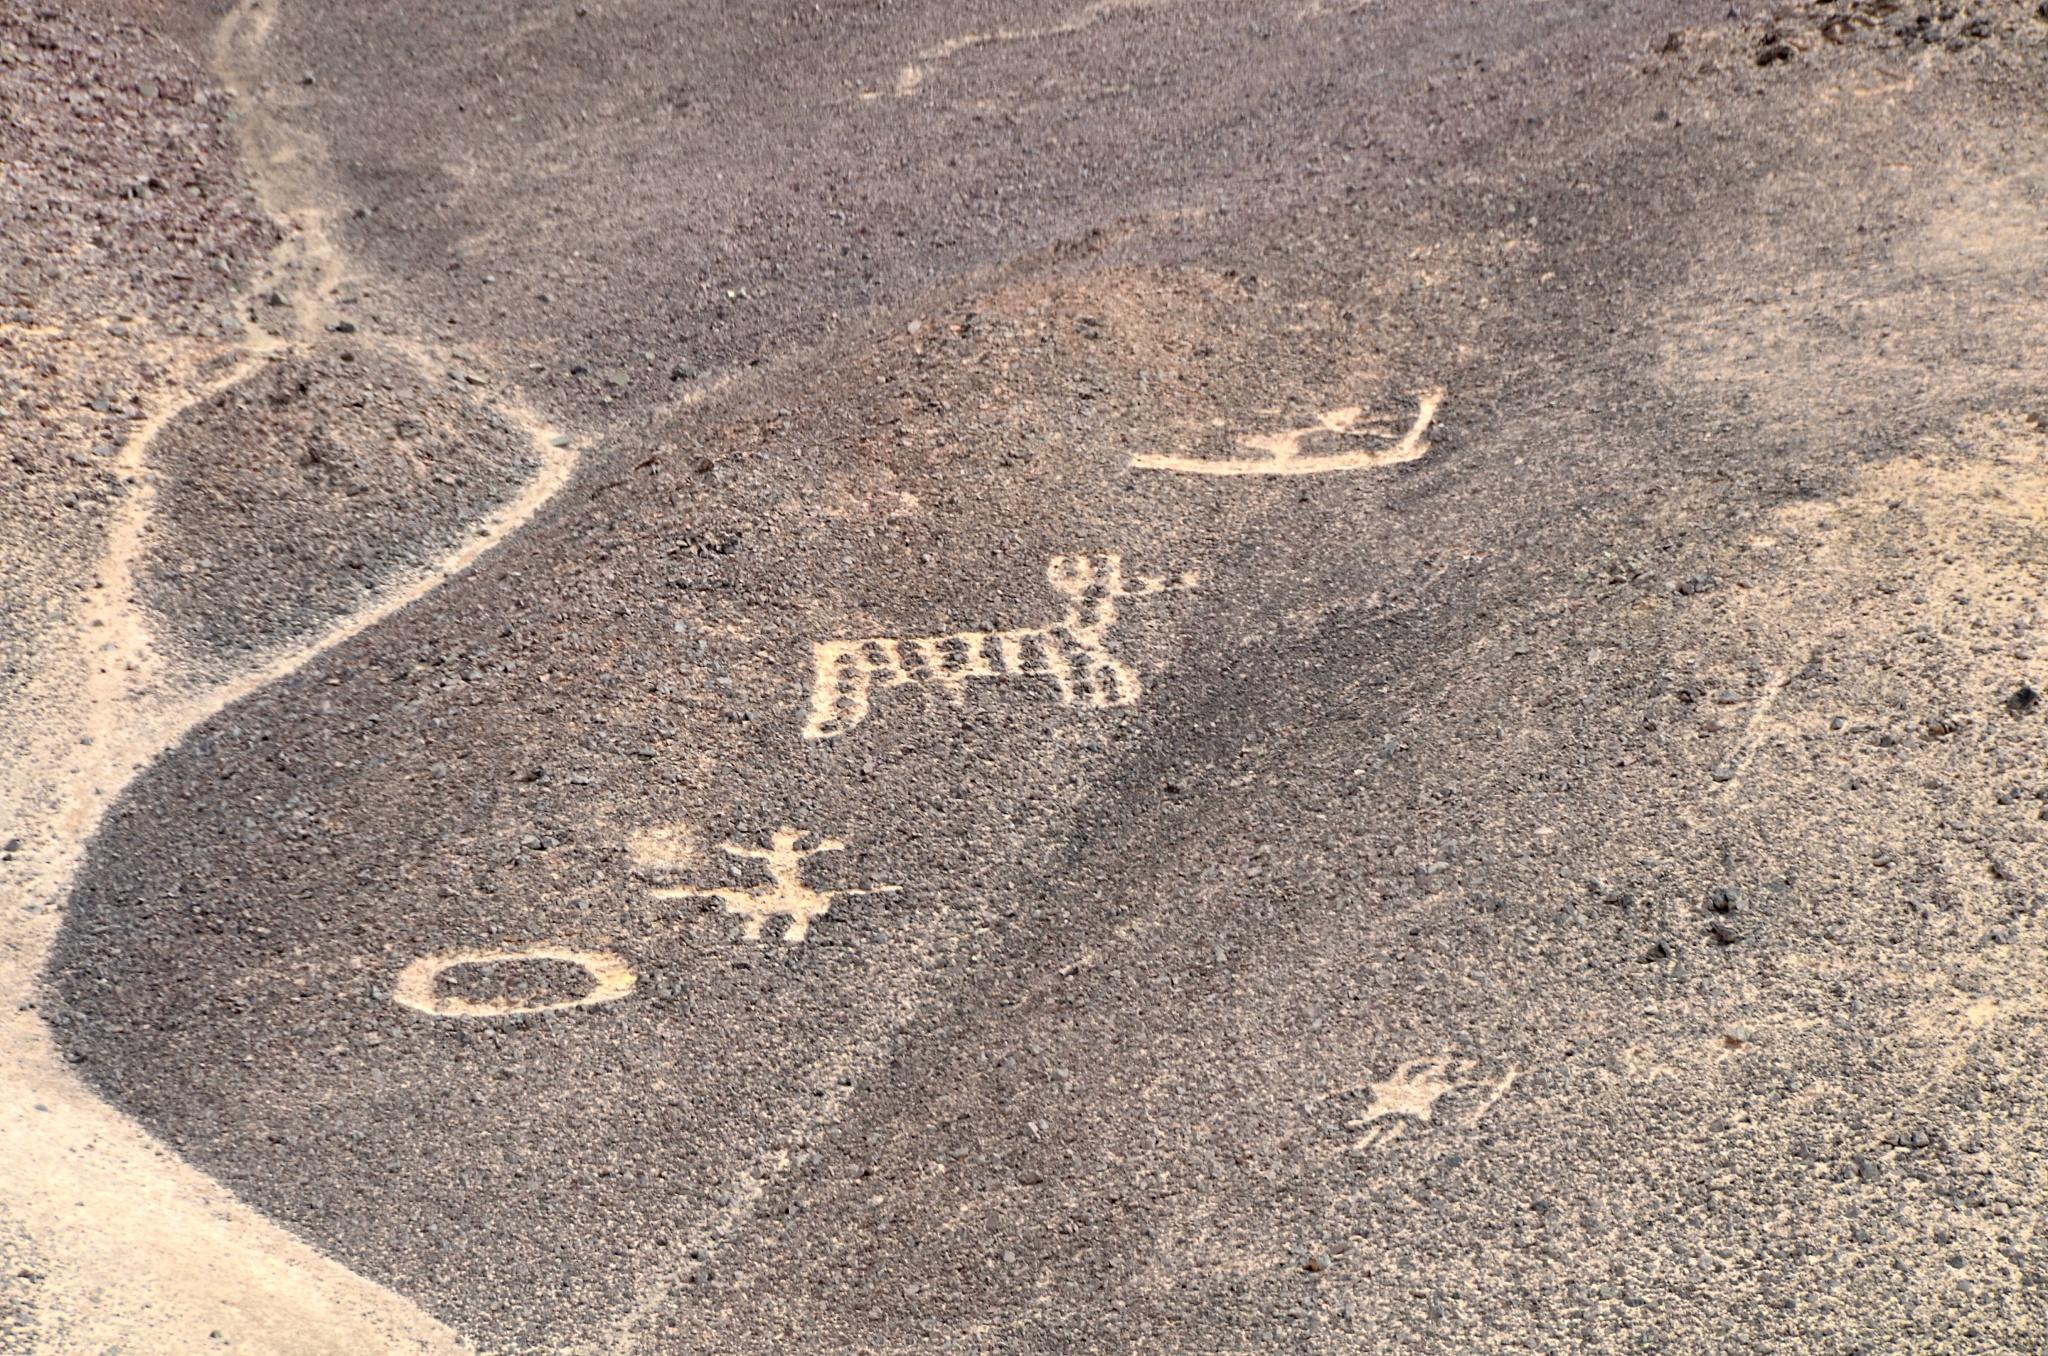 Geoglifos de Pintados